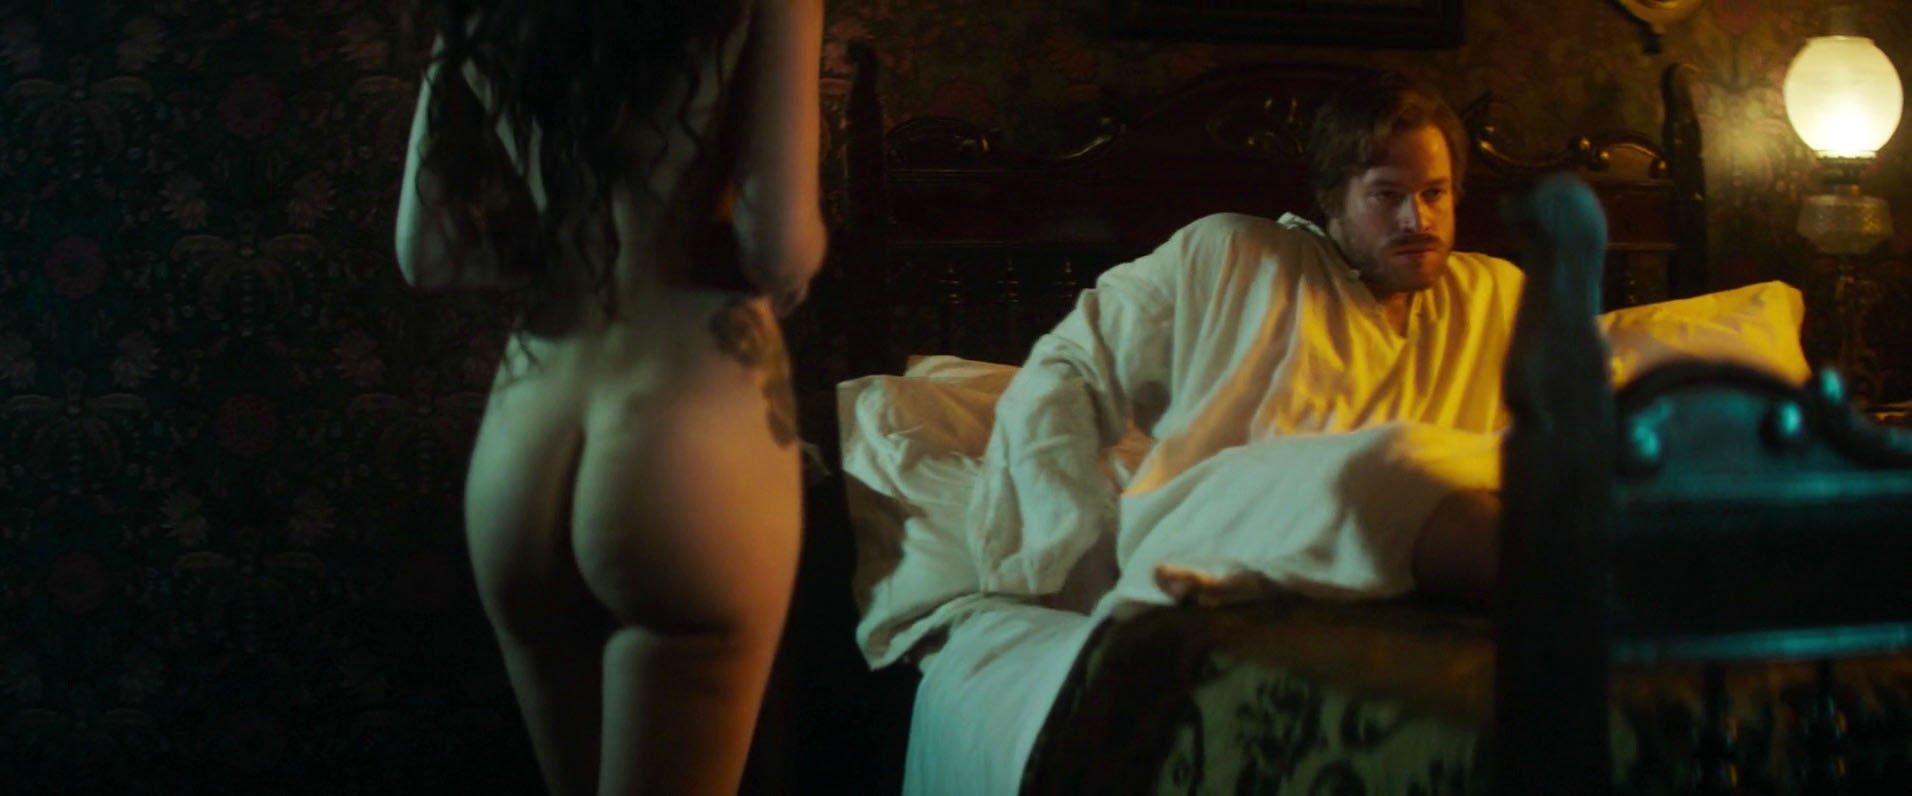 Maria bellucci 15 as aventuras sexuals de ulysses sc2 - 2 3